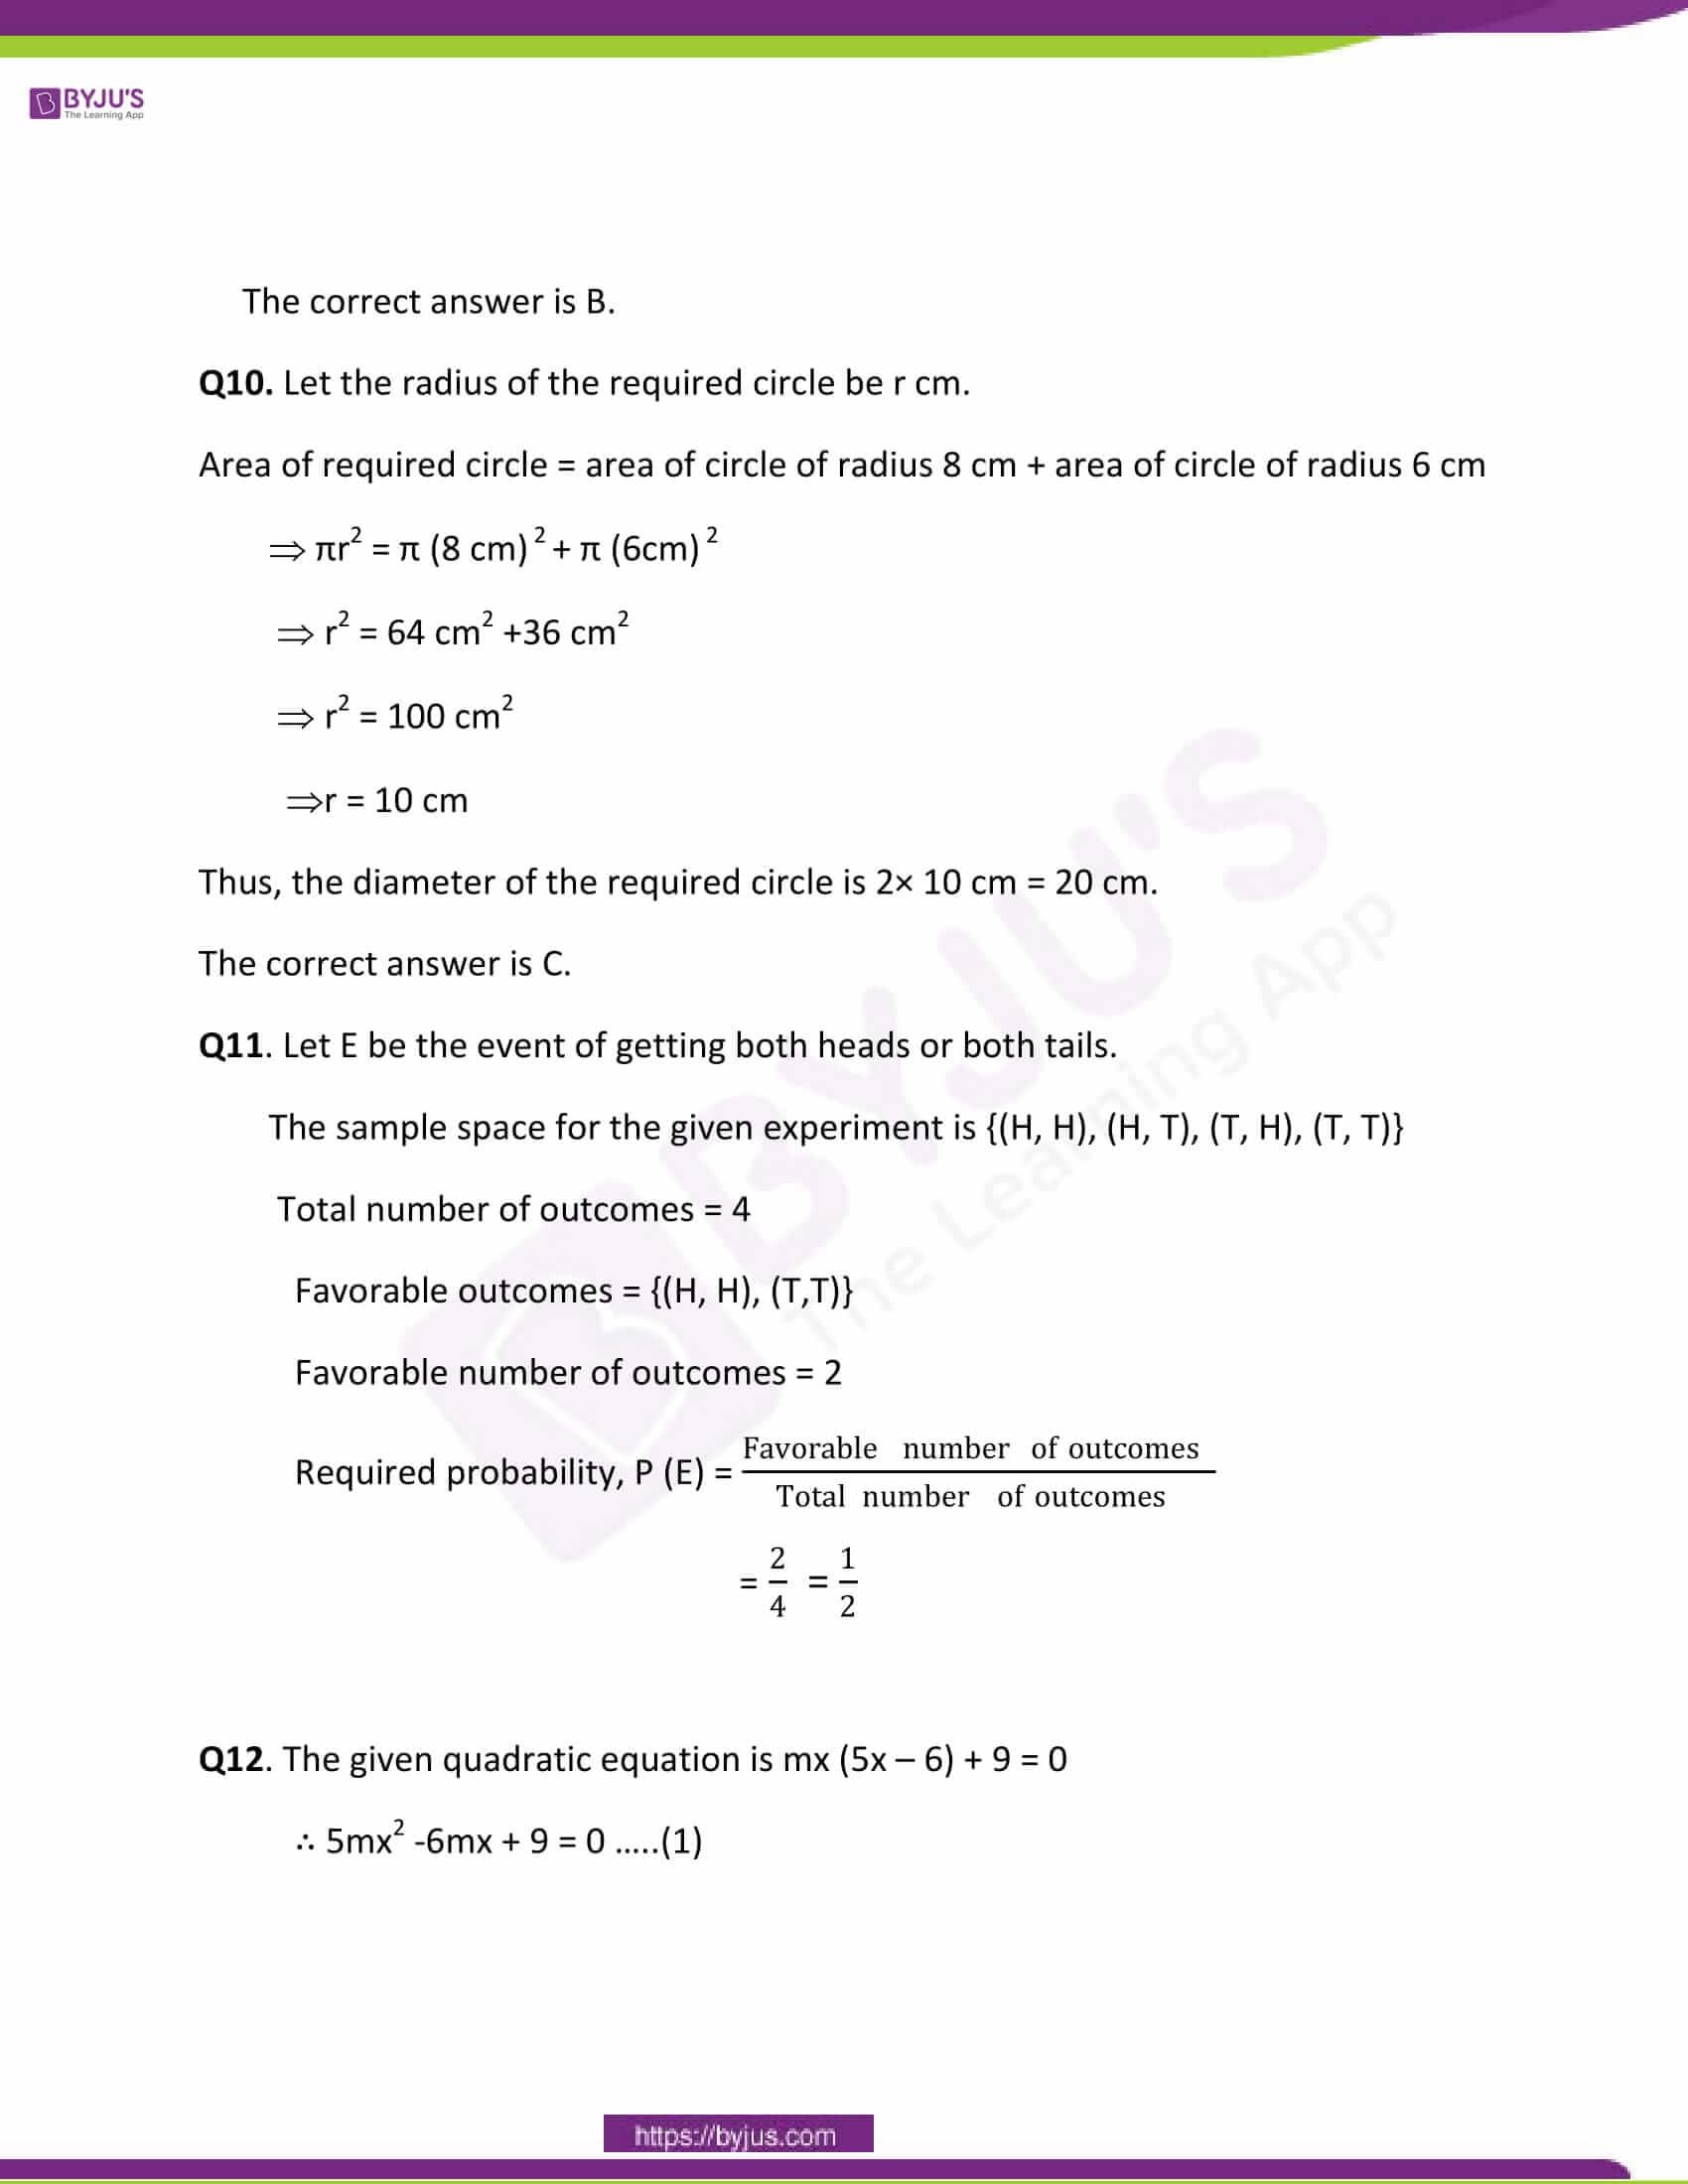 CBSE Class 10 Maths Papers Solution 2011 06